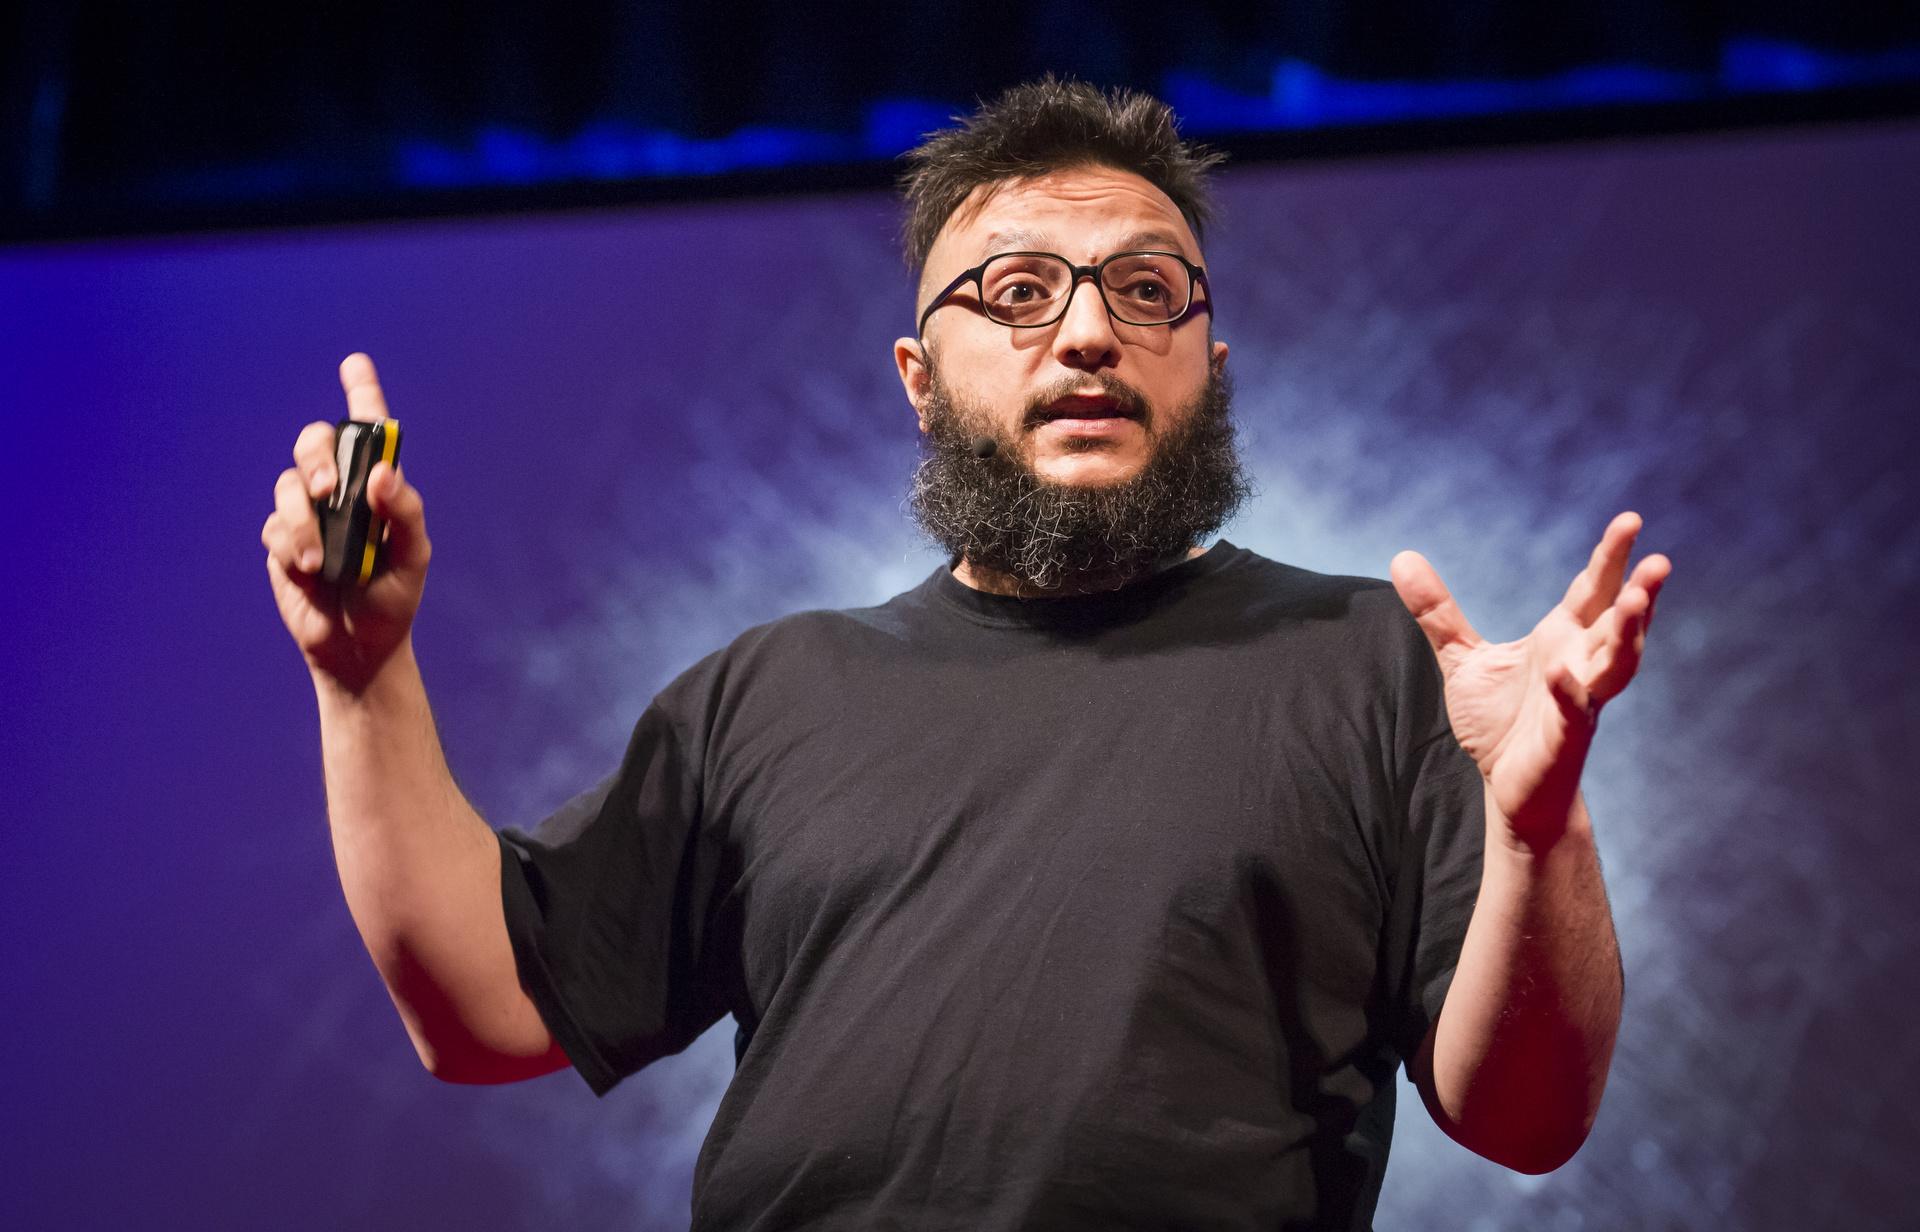 Salvatore Iaconesi at 2013 in Edinburgh, Scotland. June 12-15, 2013. Photo: James Duncan Davidson